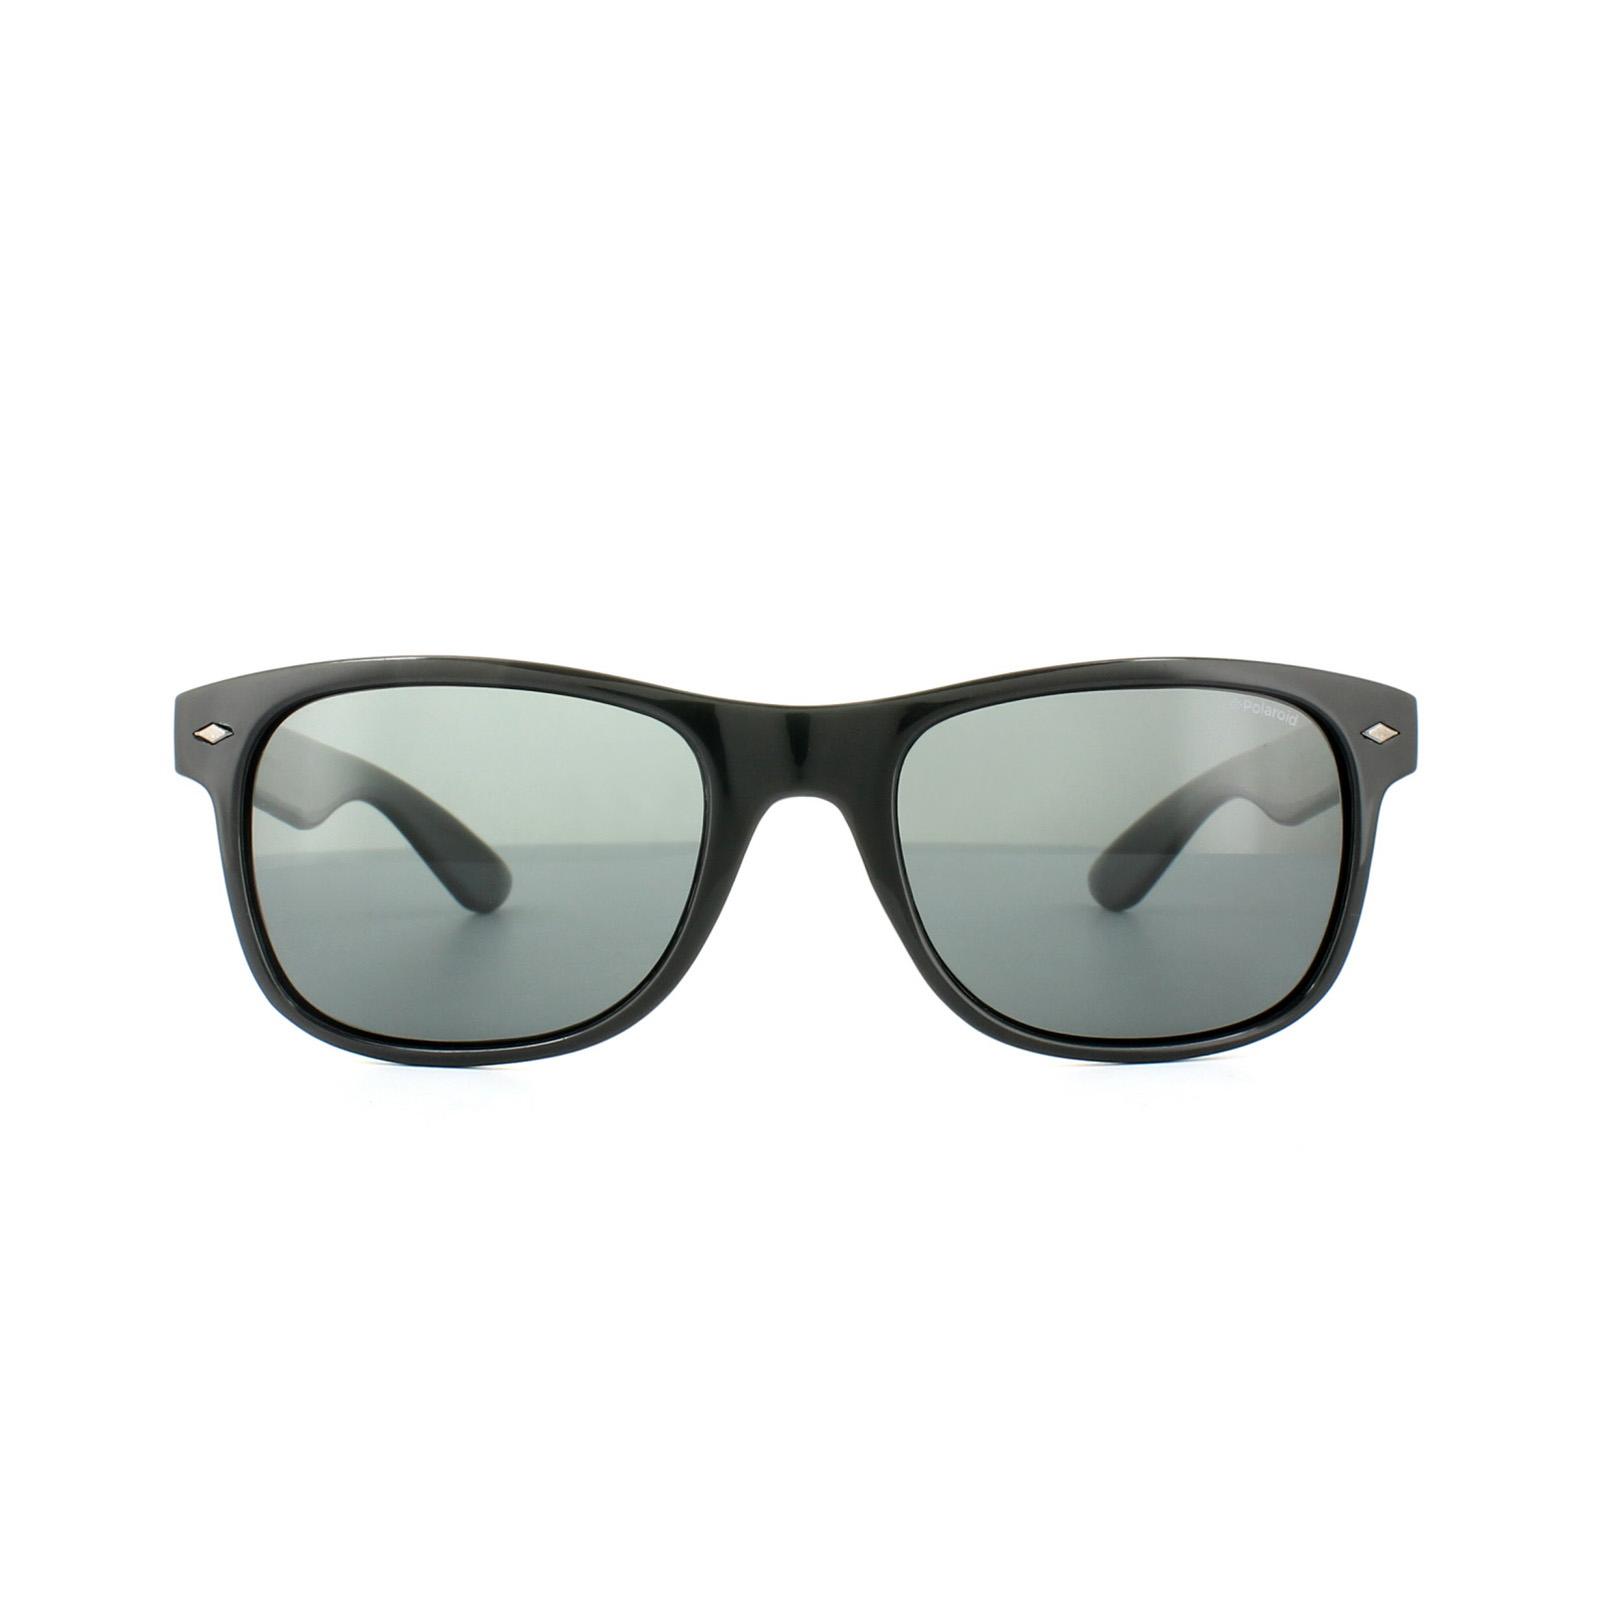 6338d86a71 Sentinel Polaroid Sunglasses PLD 1015/S D28 Y2 Shiny Black Grey Polarized